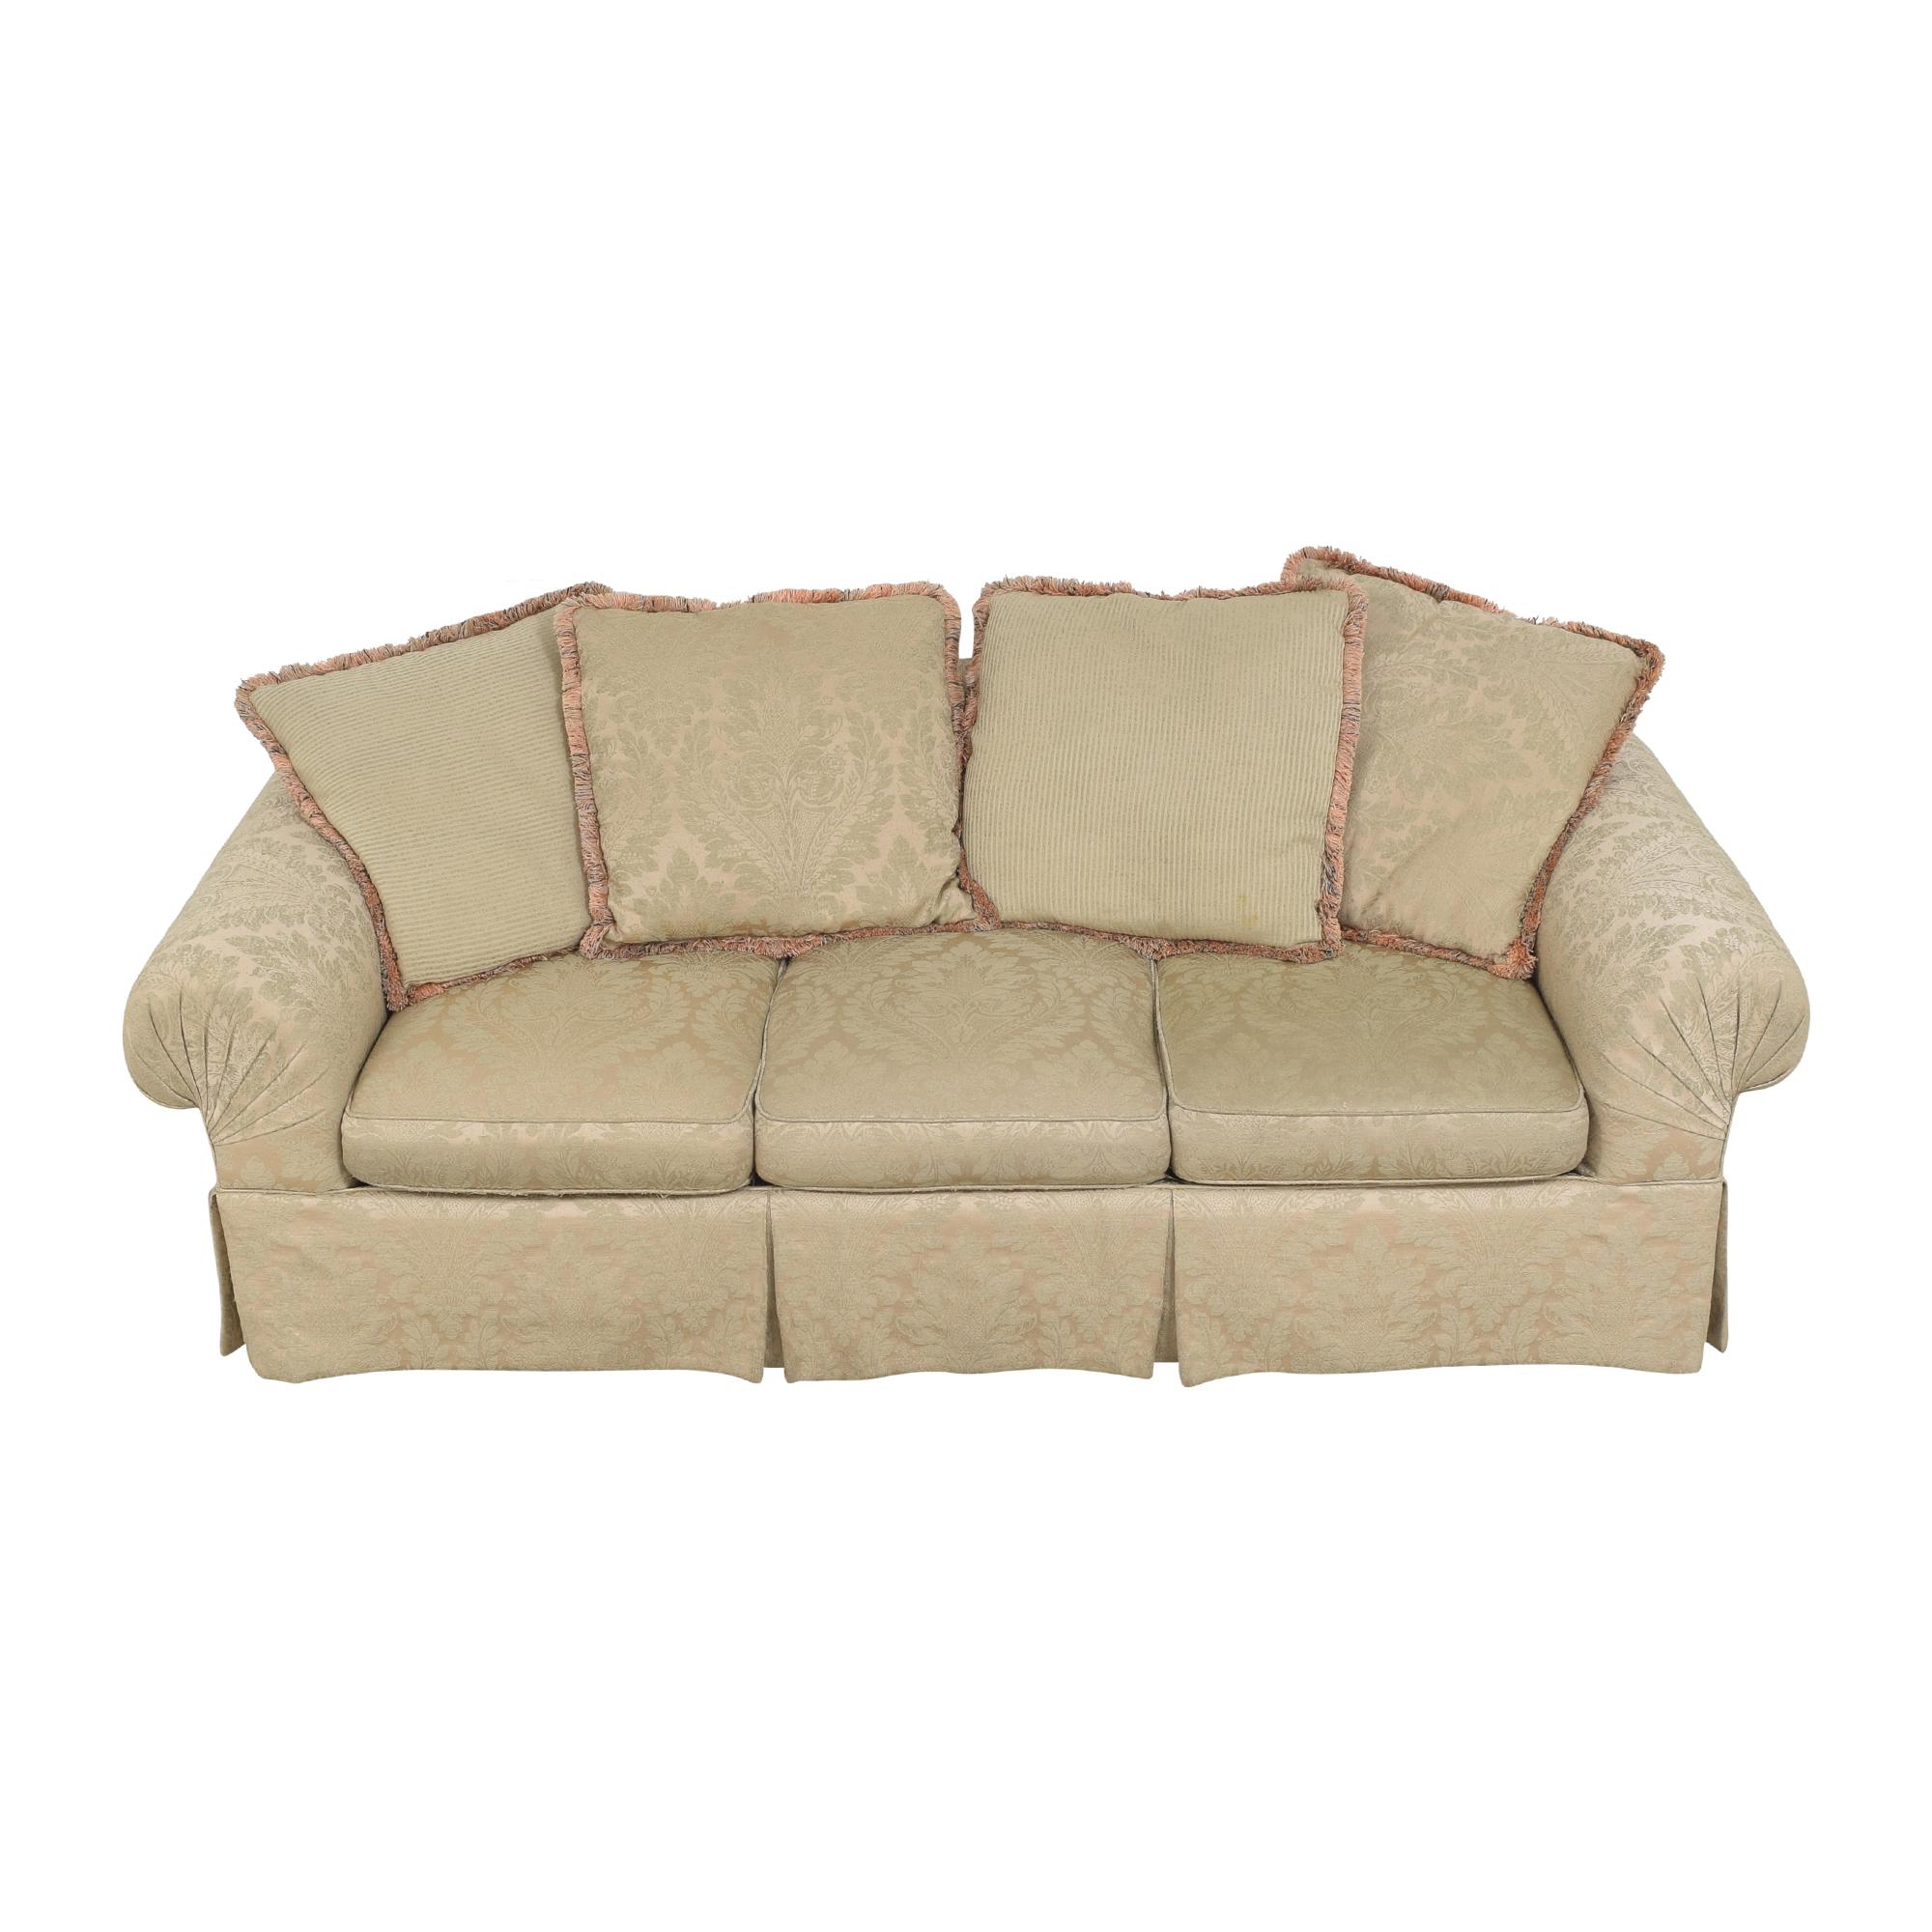 Lexington Furniture Lexington Furniture Skirted Roll Arm Sofa price